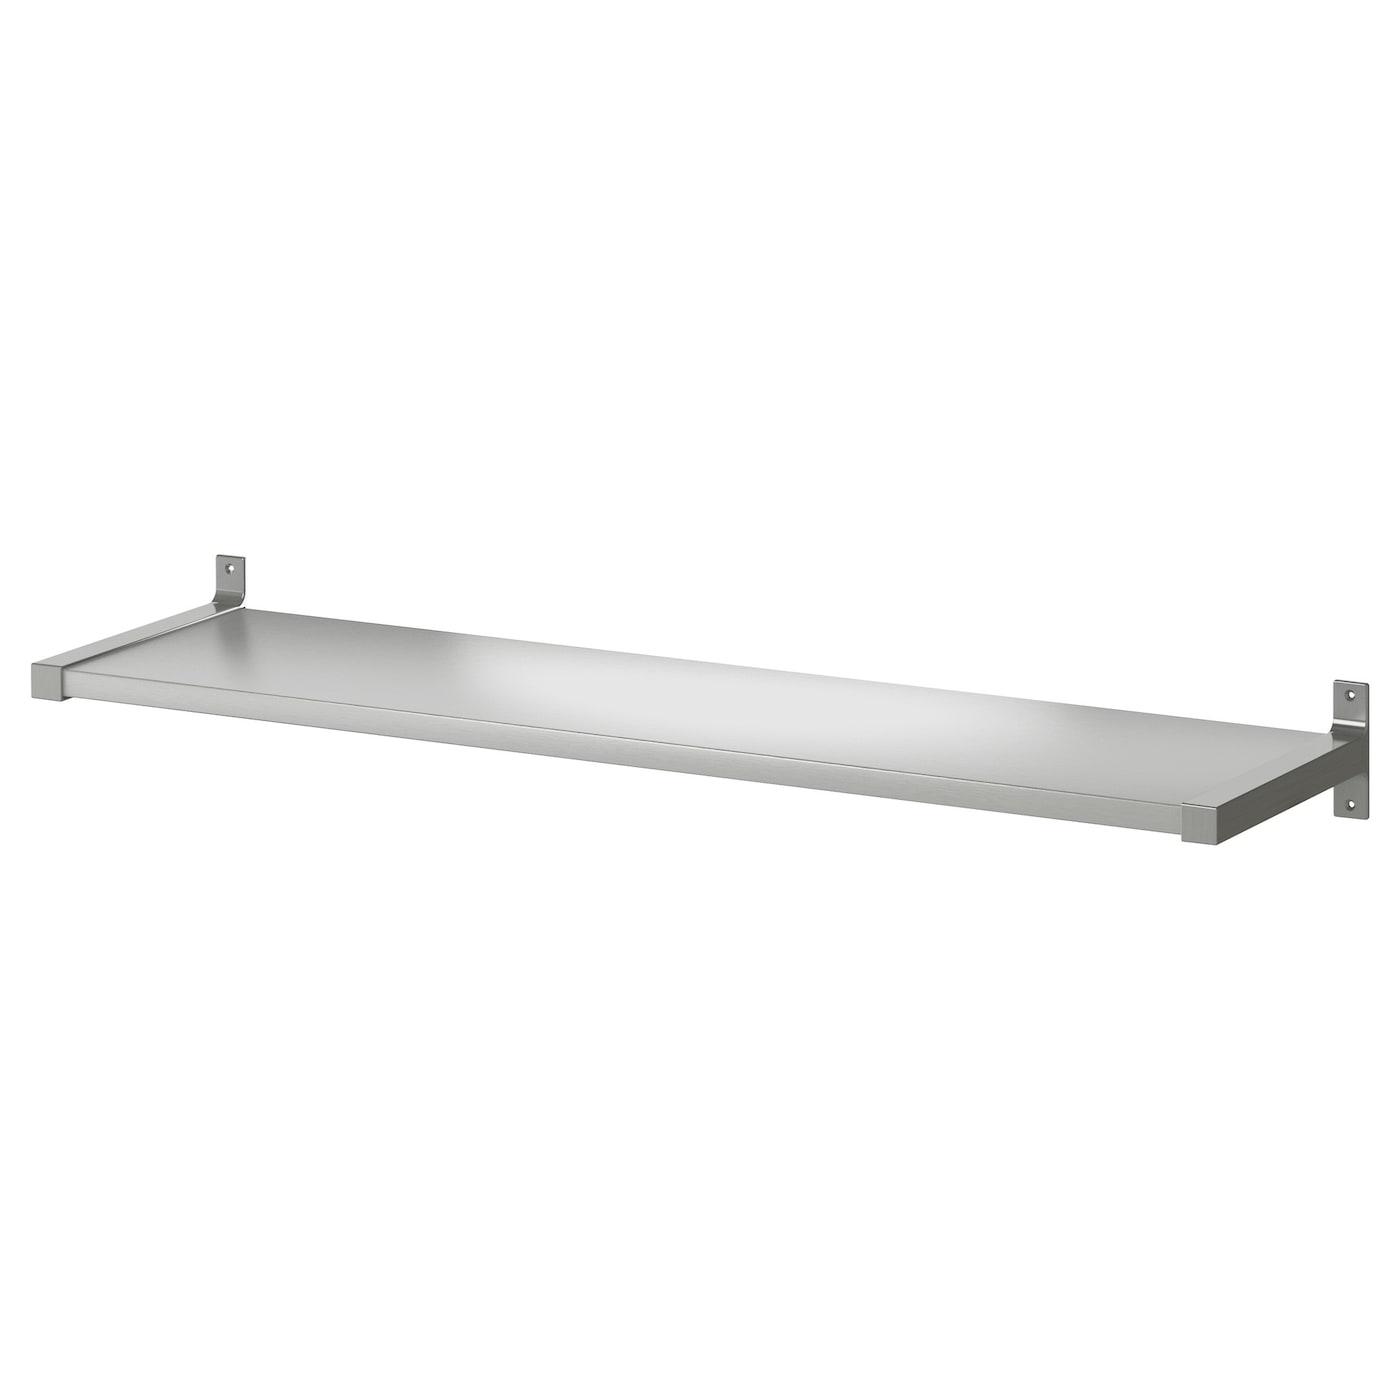 Ekby bj rnum ekby mossby wandplank aluminium 119 x 28 cm for Ikea mensole acciaio